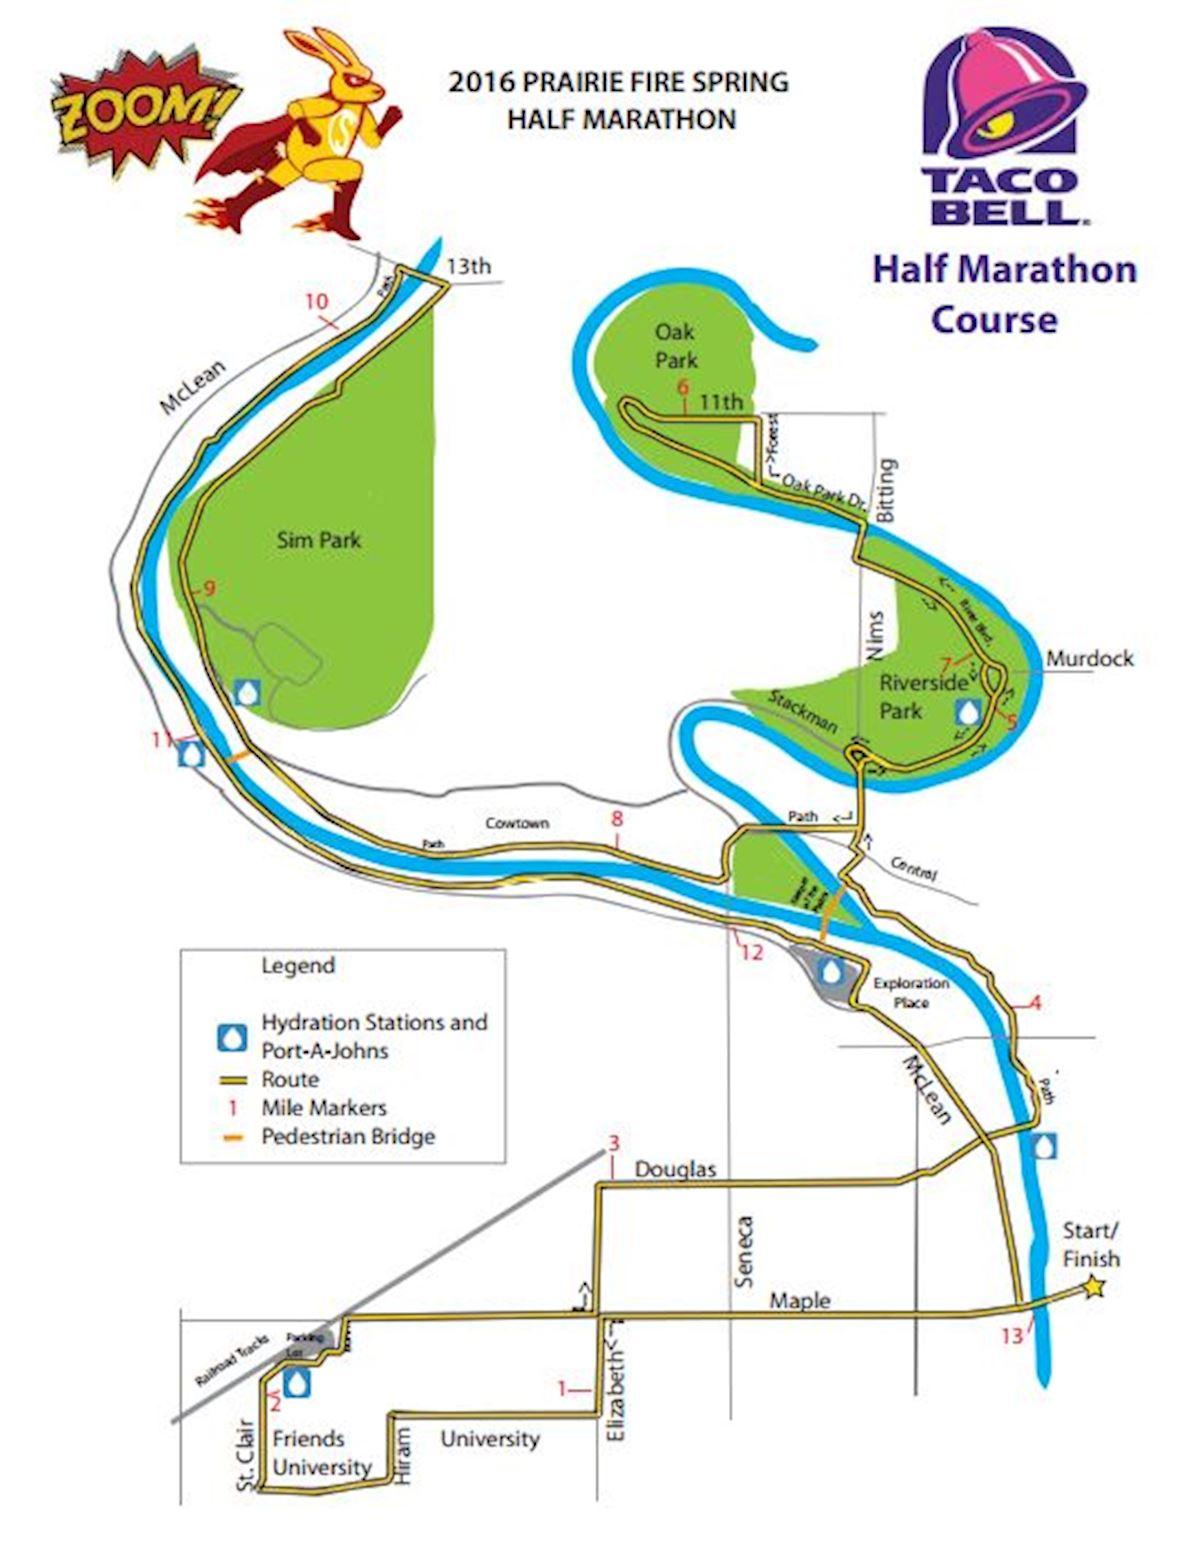 Prairie Fire Spring Half Marathon MAPA DEL RECORRIDO DE